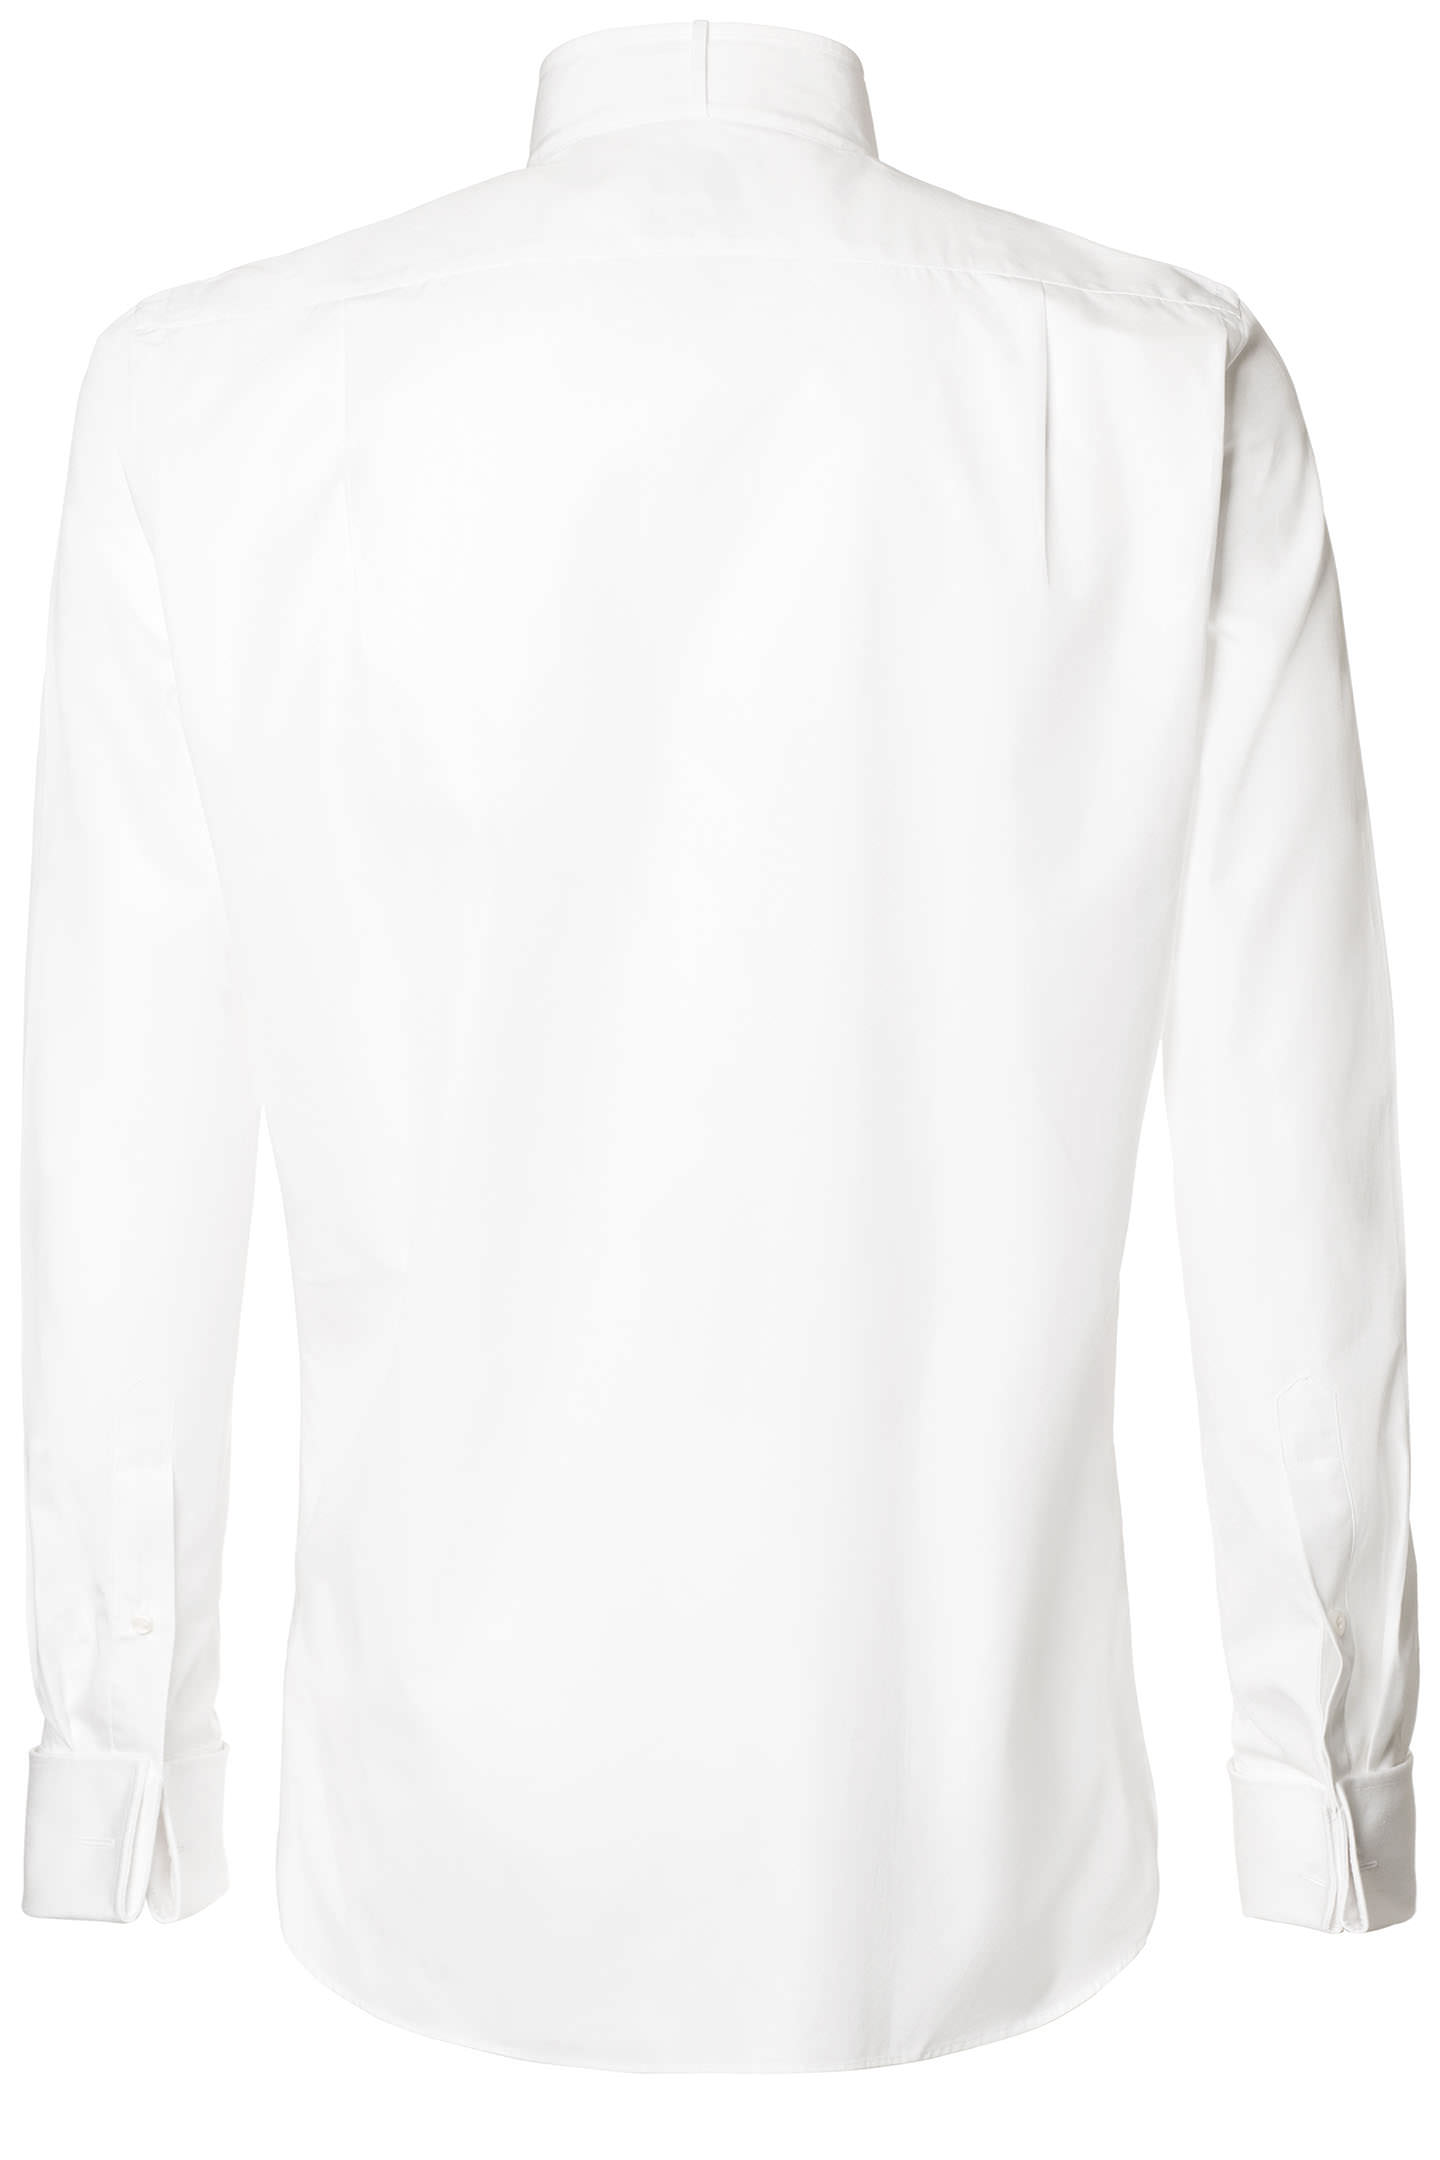 Tuxedo plisse shirt two ply popeline cotton boggi for 2 ply cotton shirts